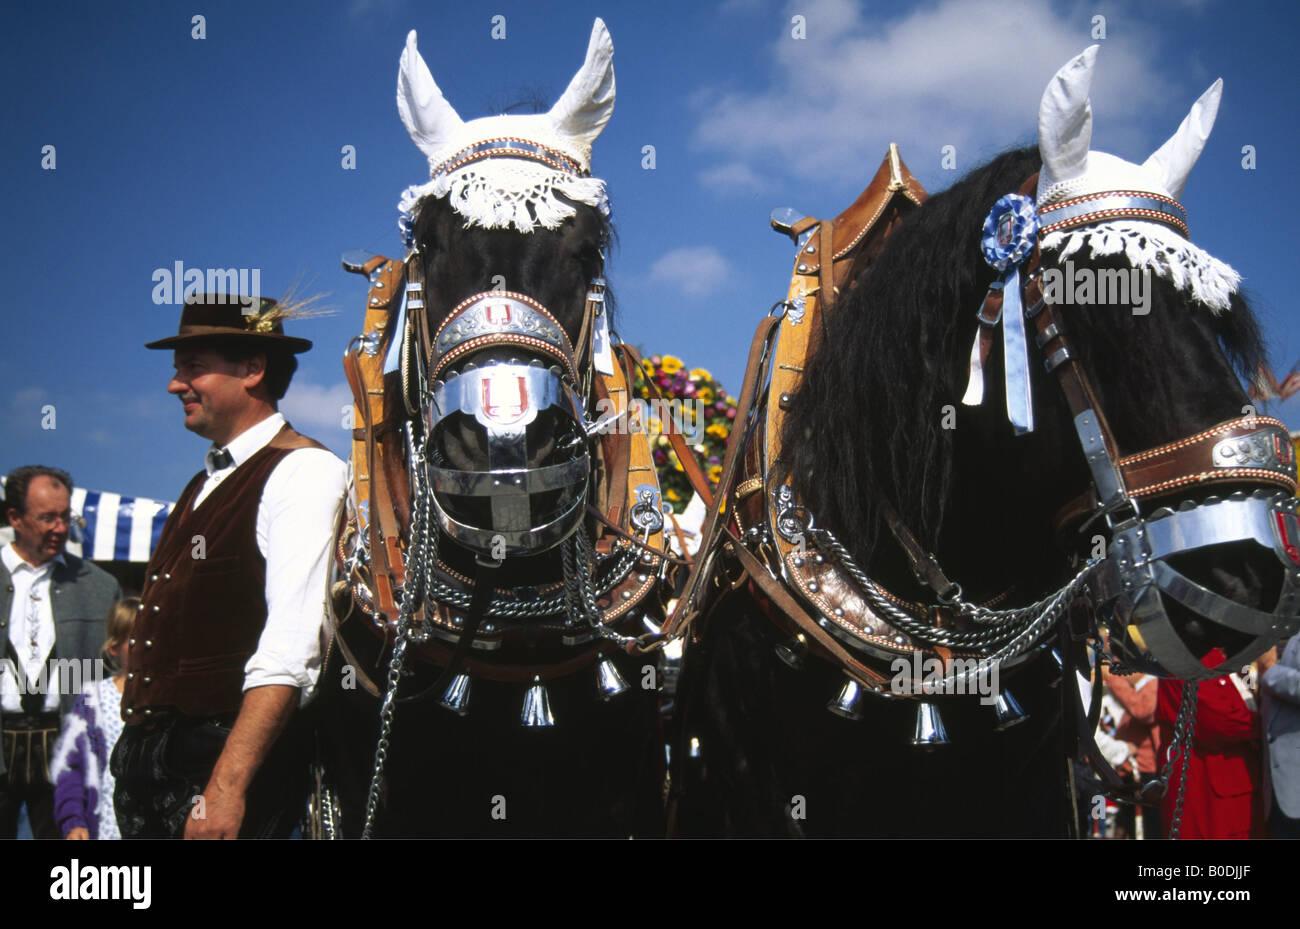 Brewer Oktoberfest Munich Bavaria Germany - Stock Image